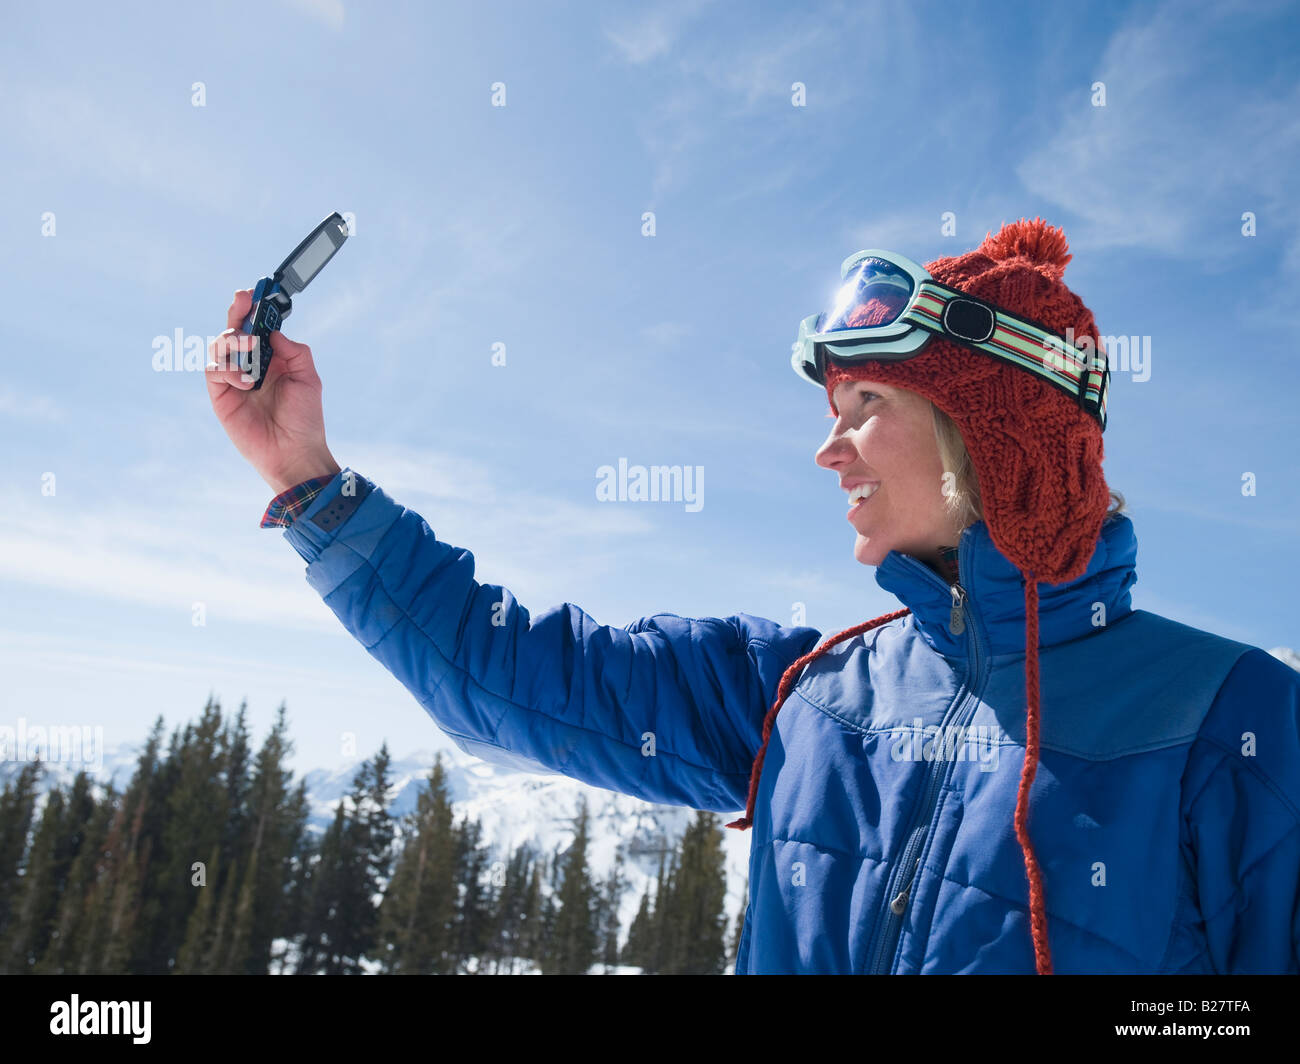 Woman in ski gear taking photograph - Stock Image